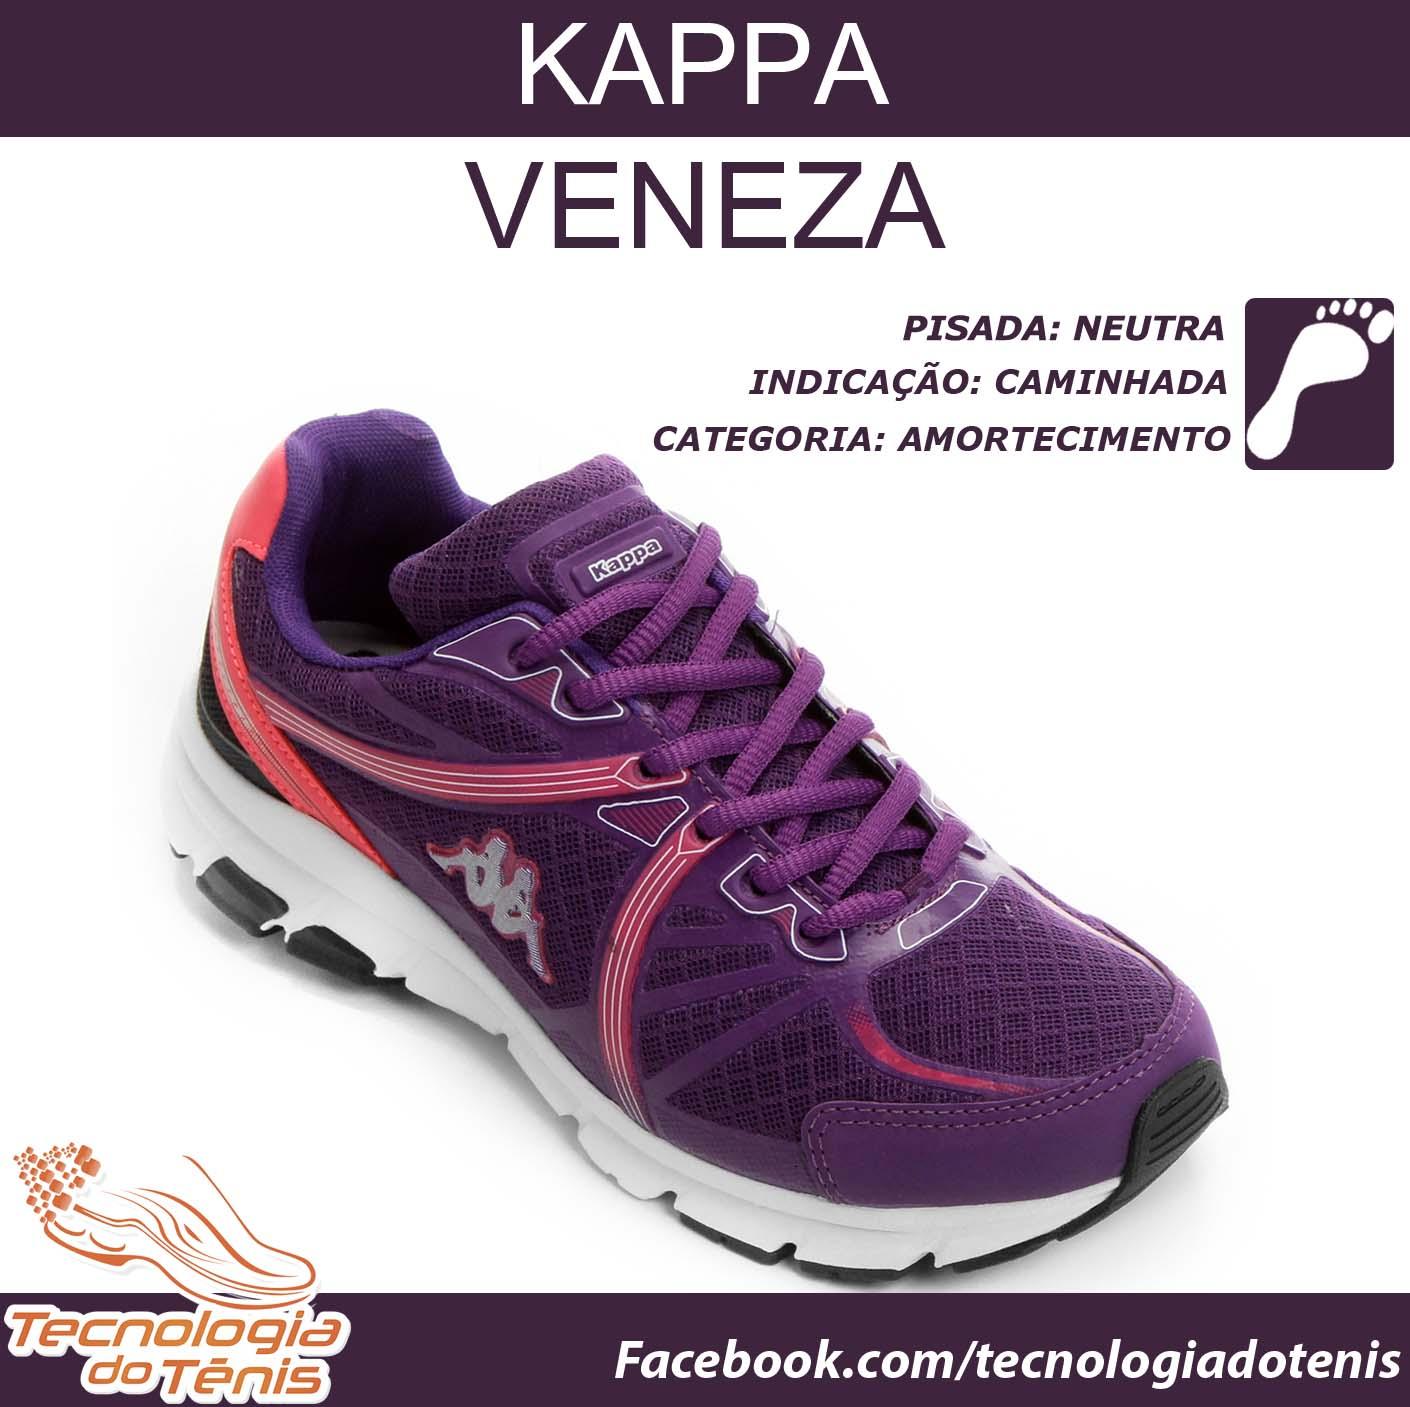 46f838ec532 Tecnologia do Tenis - Kappa Veneza-